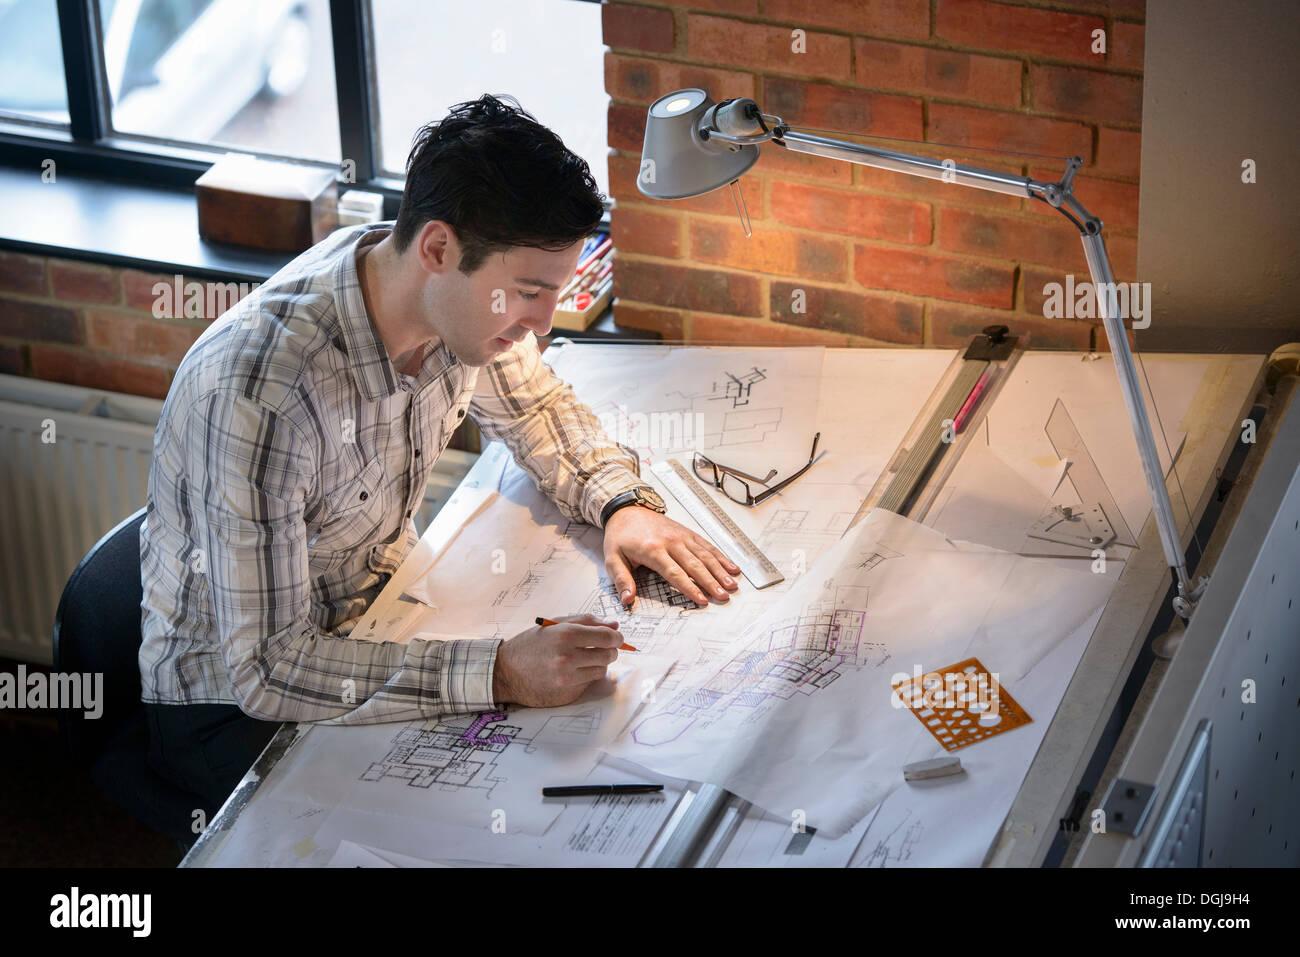 Architect drawing plans at drawing board - Stock Image